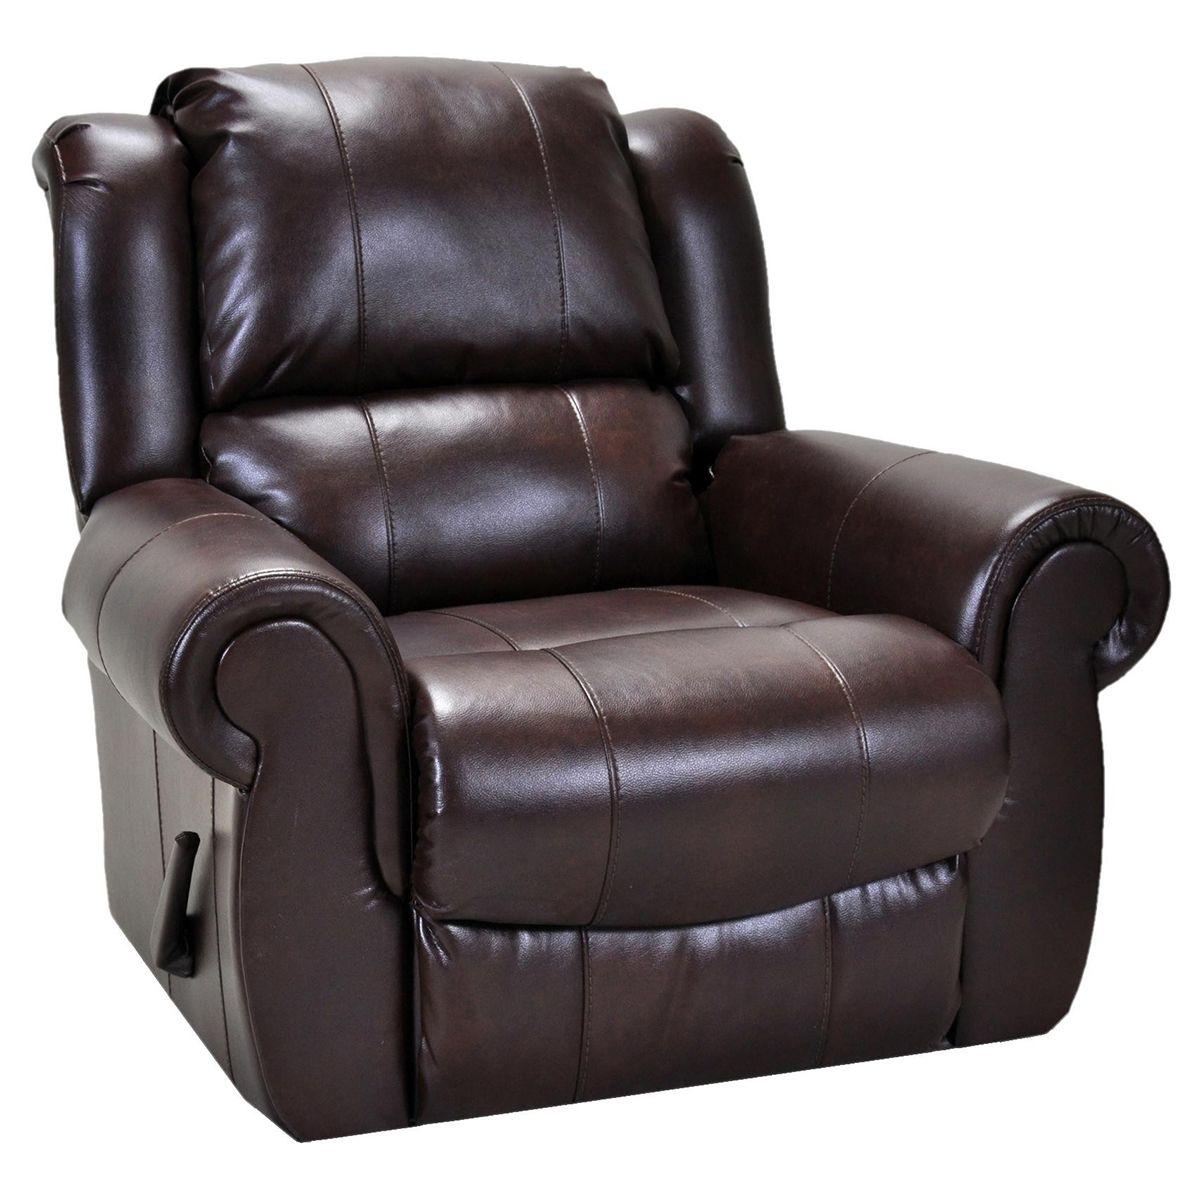 Brilliant The Dump Furniture Pierson Rocker Recliner Dump Andrewgaddart Wooden Chair Designs For Living Room Andrewgaddartcom